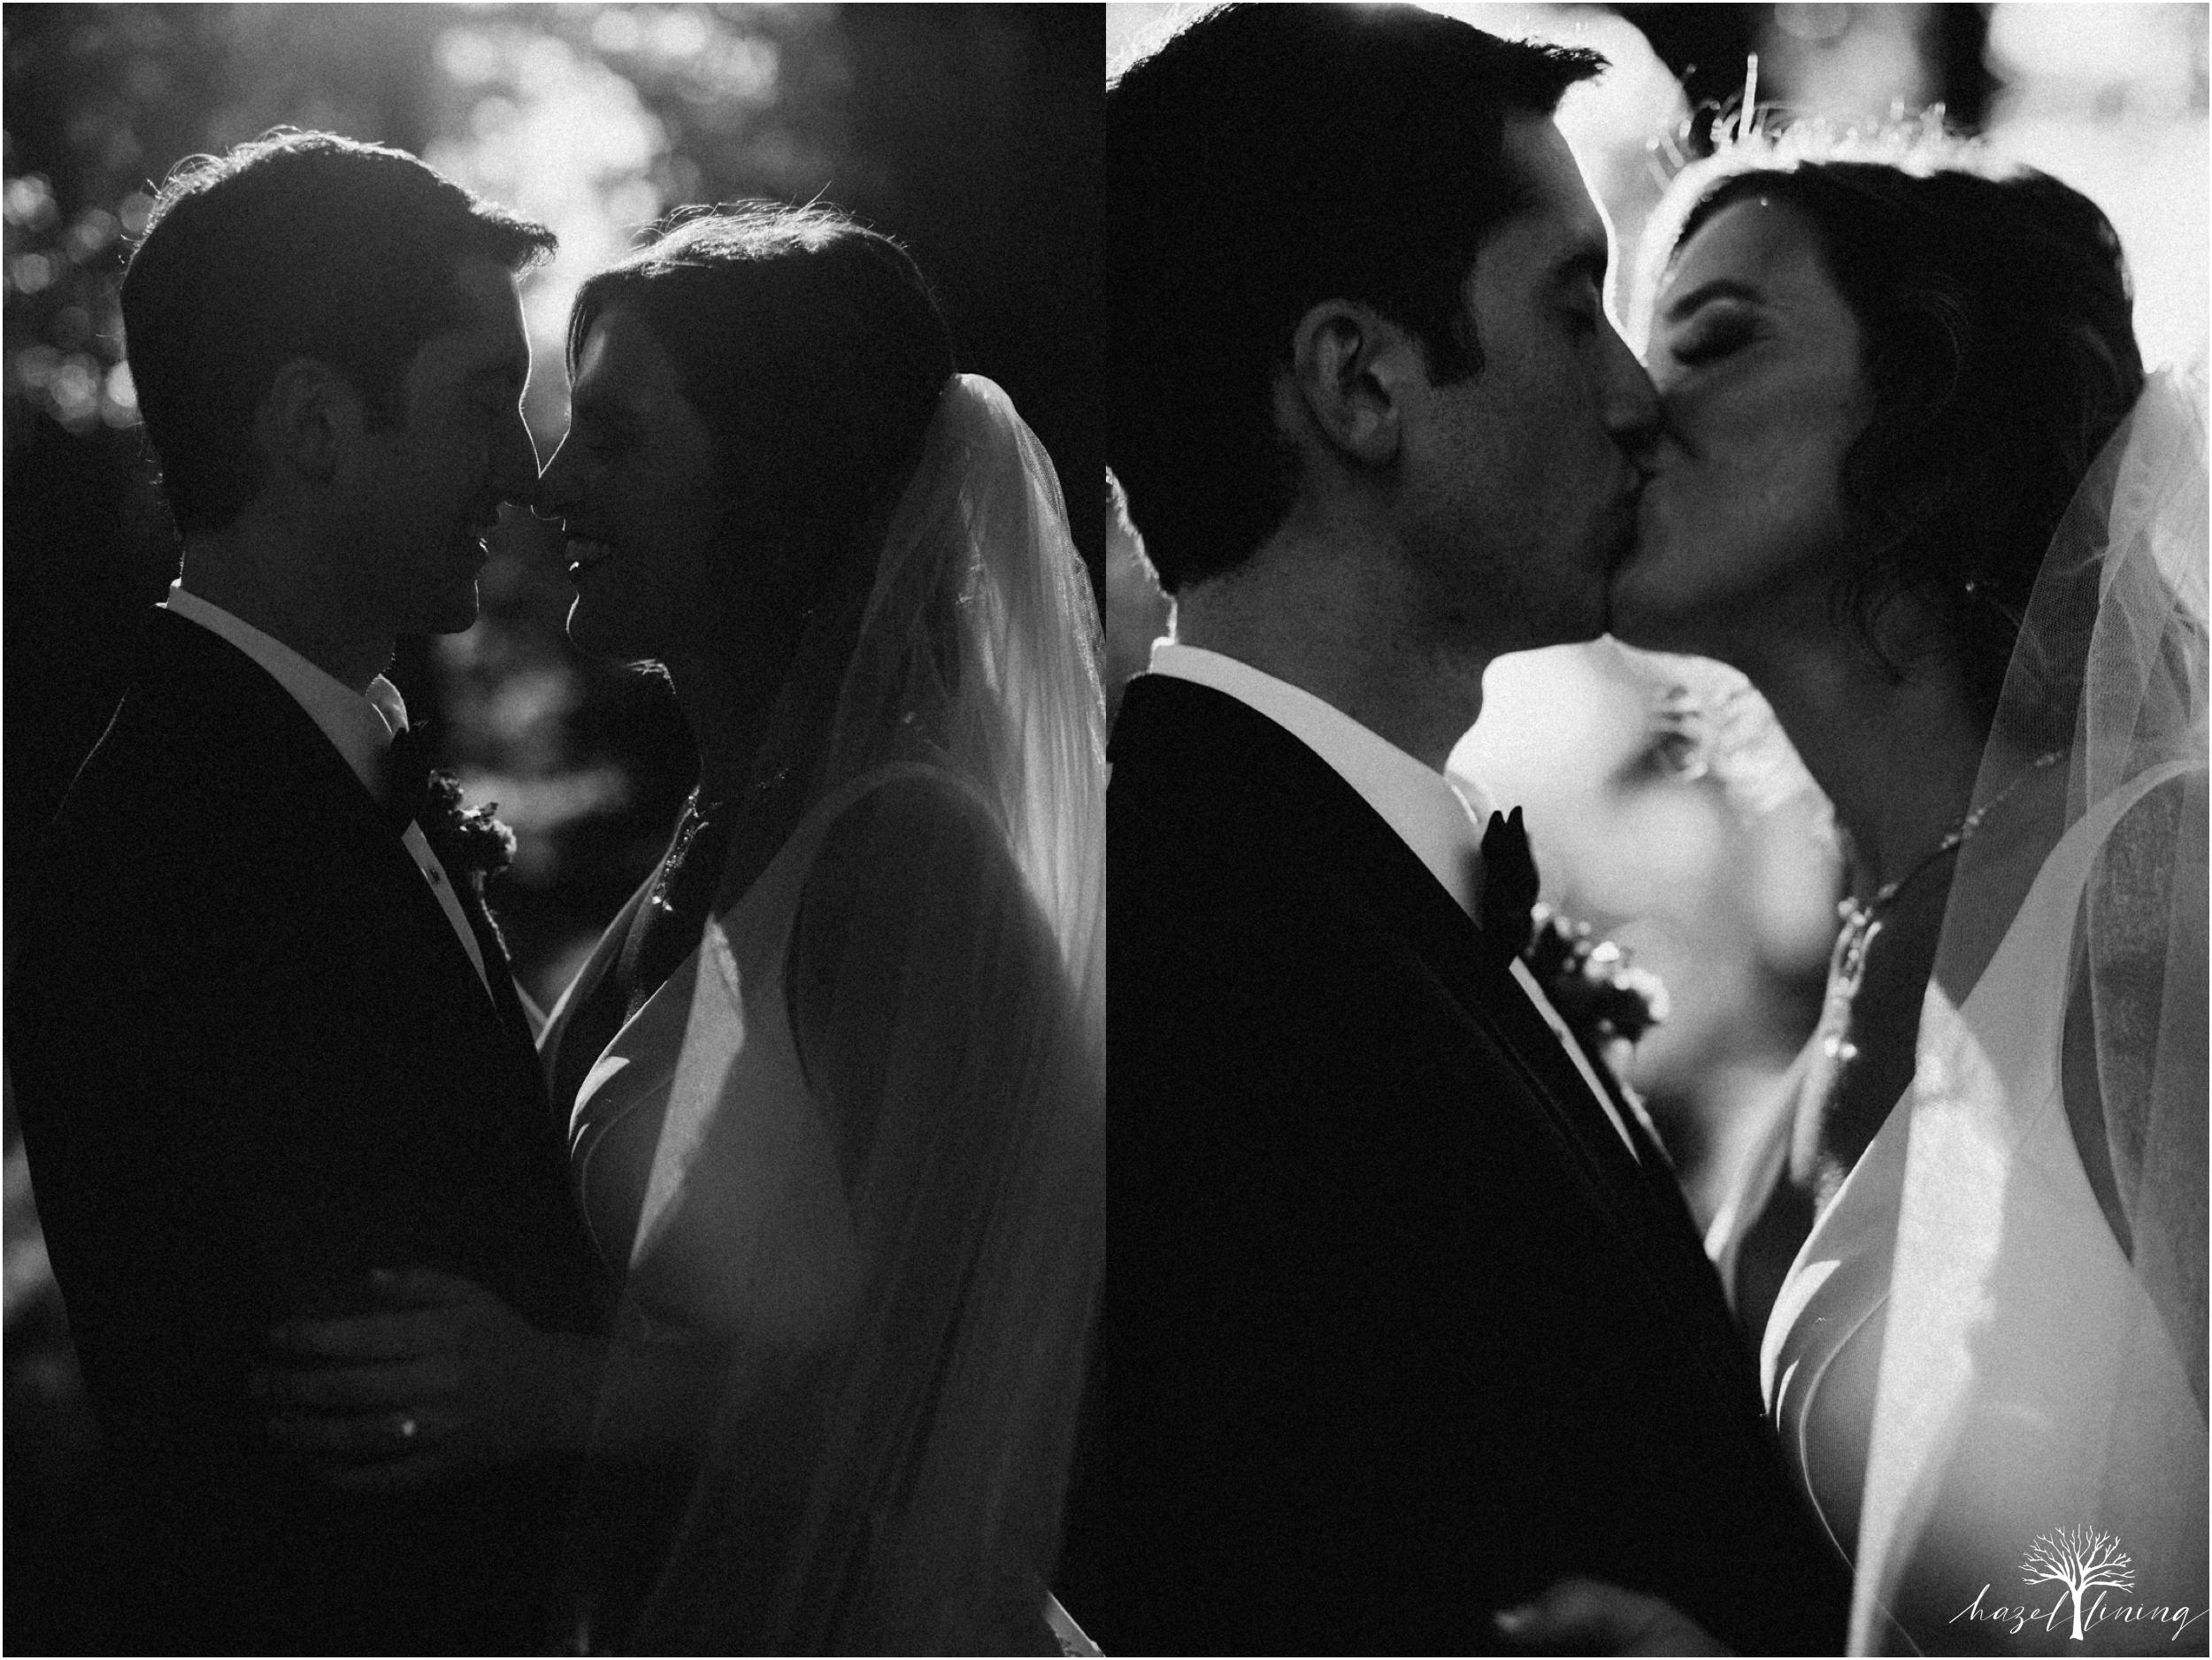 maureen-hepner-anthony-giordano-rose-bank-winery-newtow-pennsylvania-luxury-summer-wedding-hazel-lining-photography-destination-elopement-wedding-engagement-photography_0117.jpg